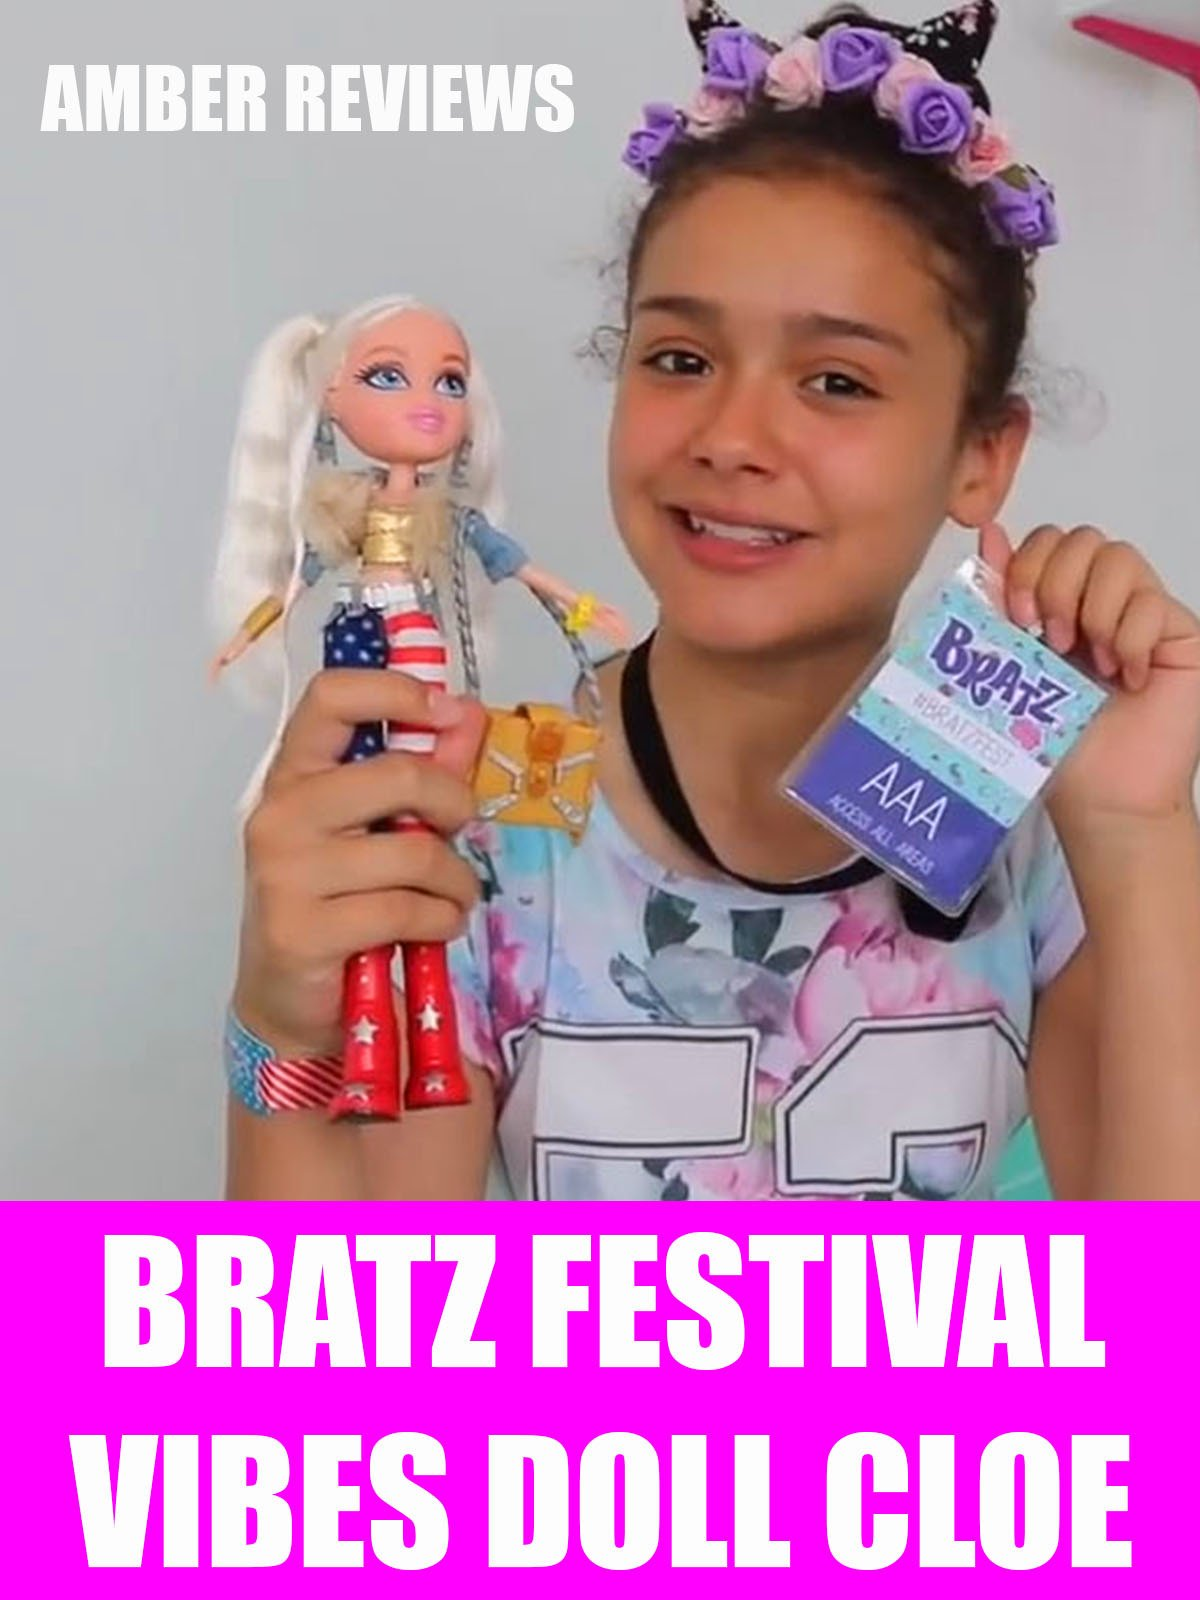 Review: Amber Reviews Bratz Festival Vibes Doll Cloe